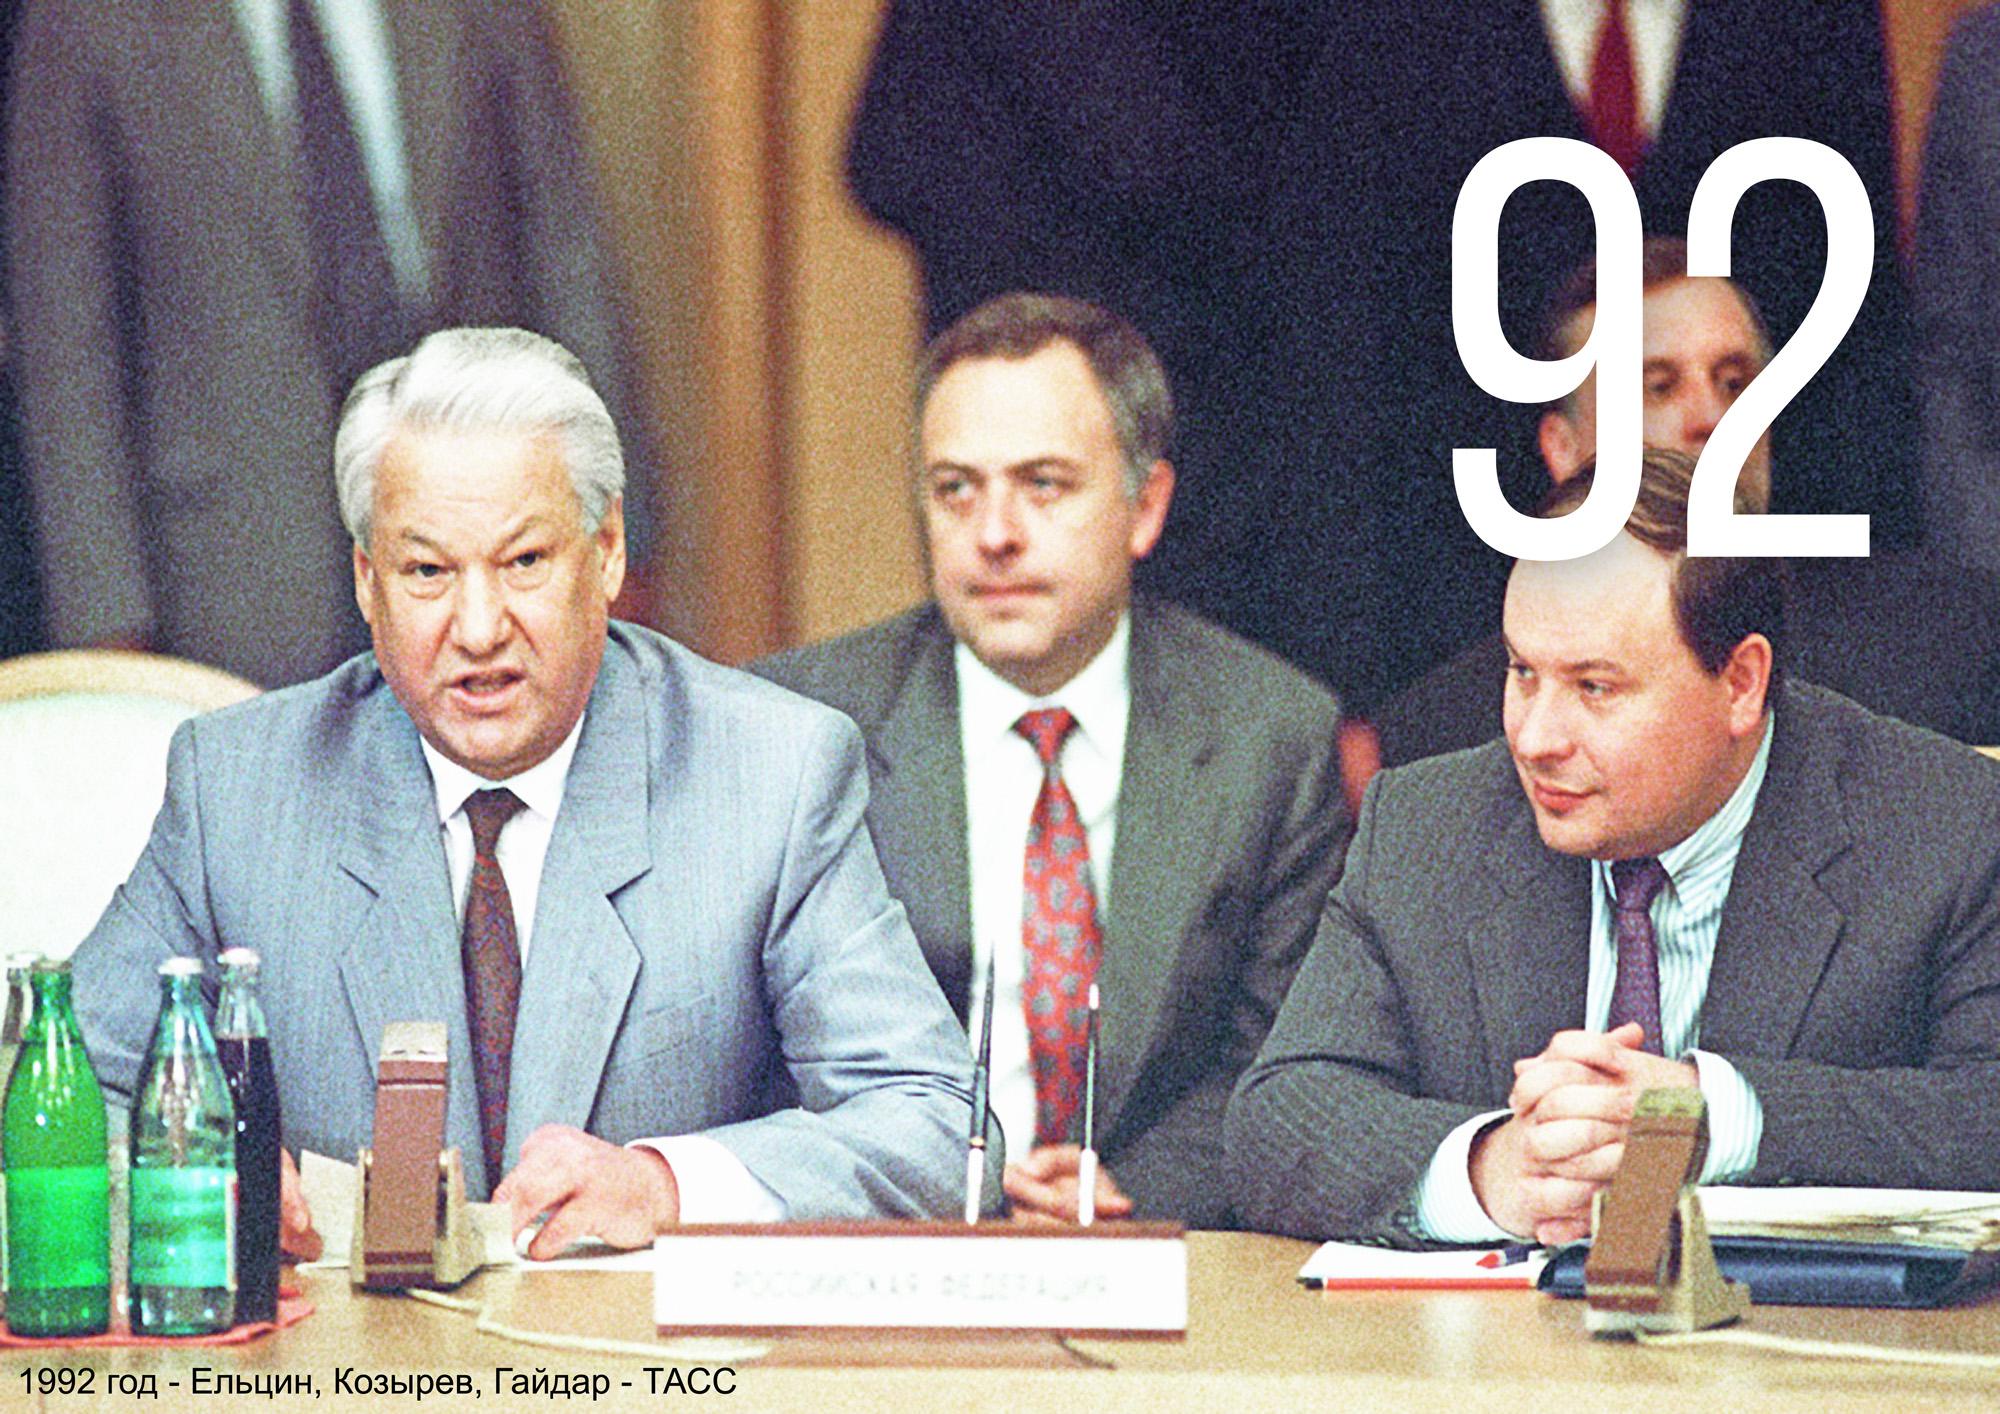 Картинки по запросу Ельцин и Гайдар 92